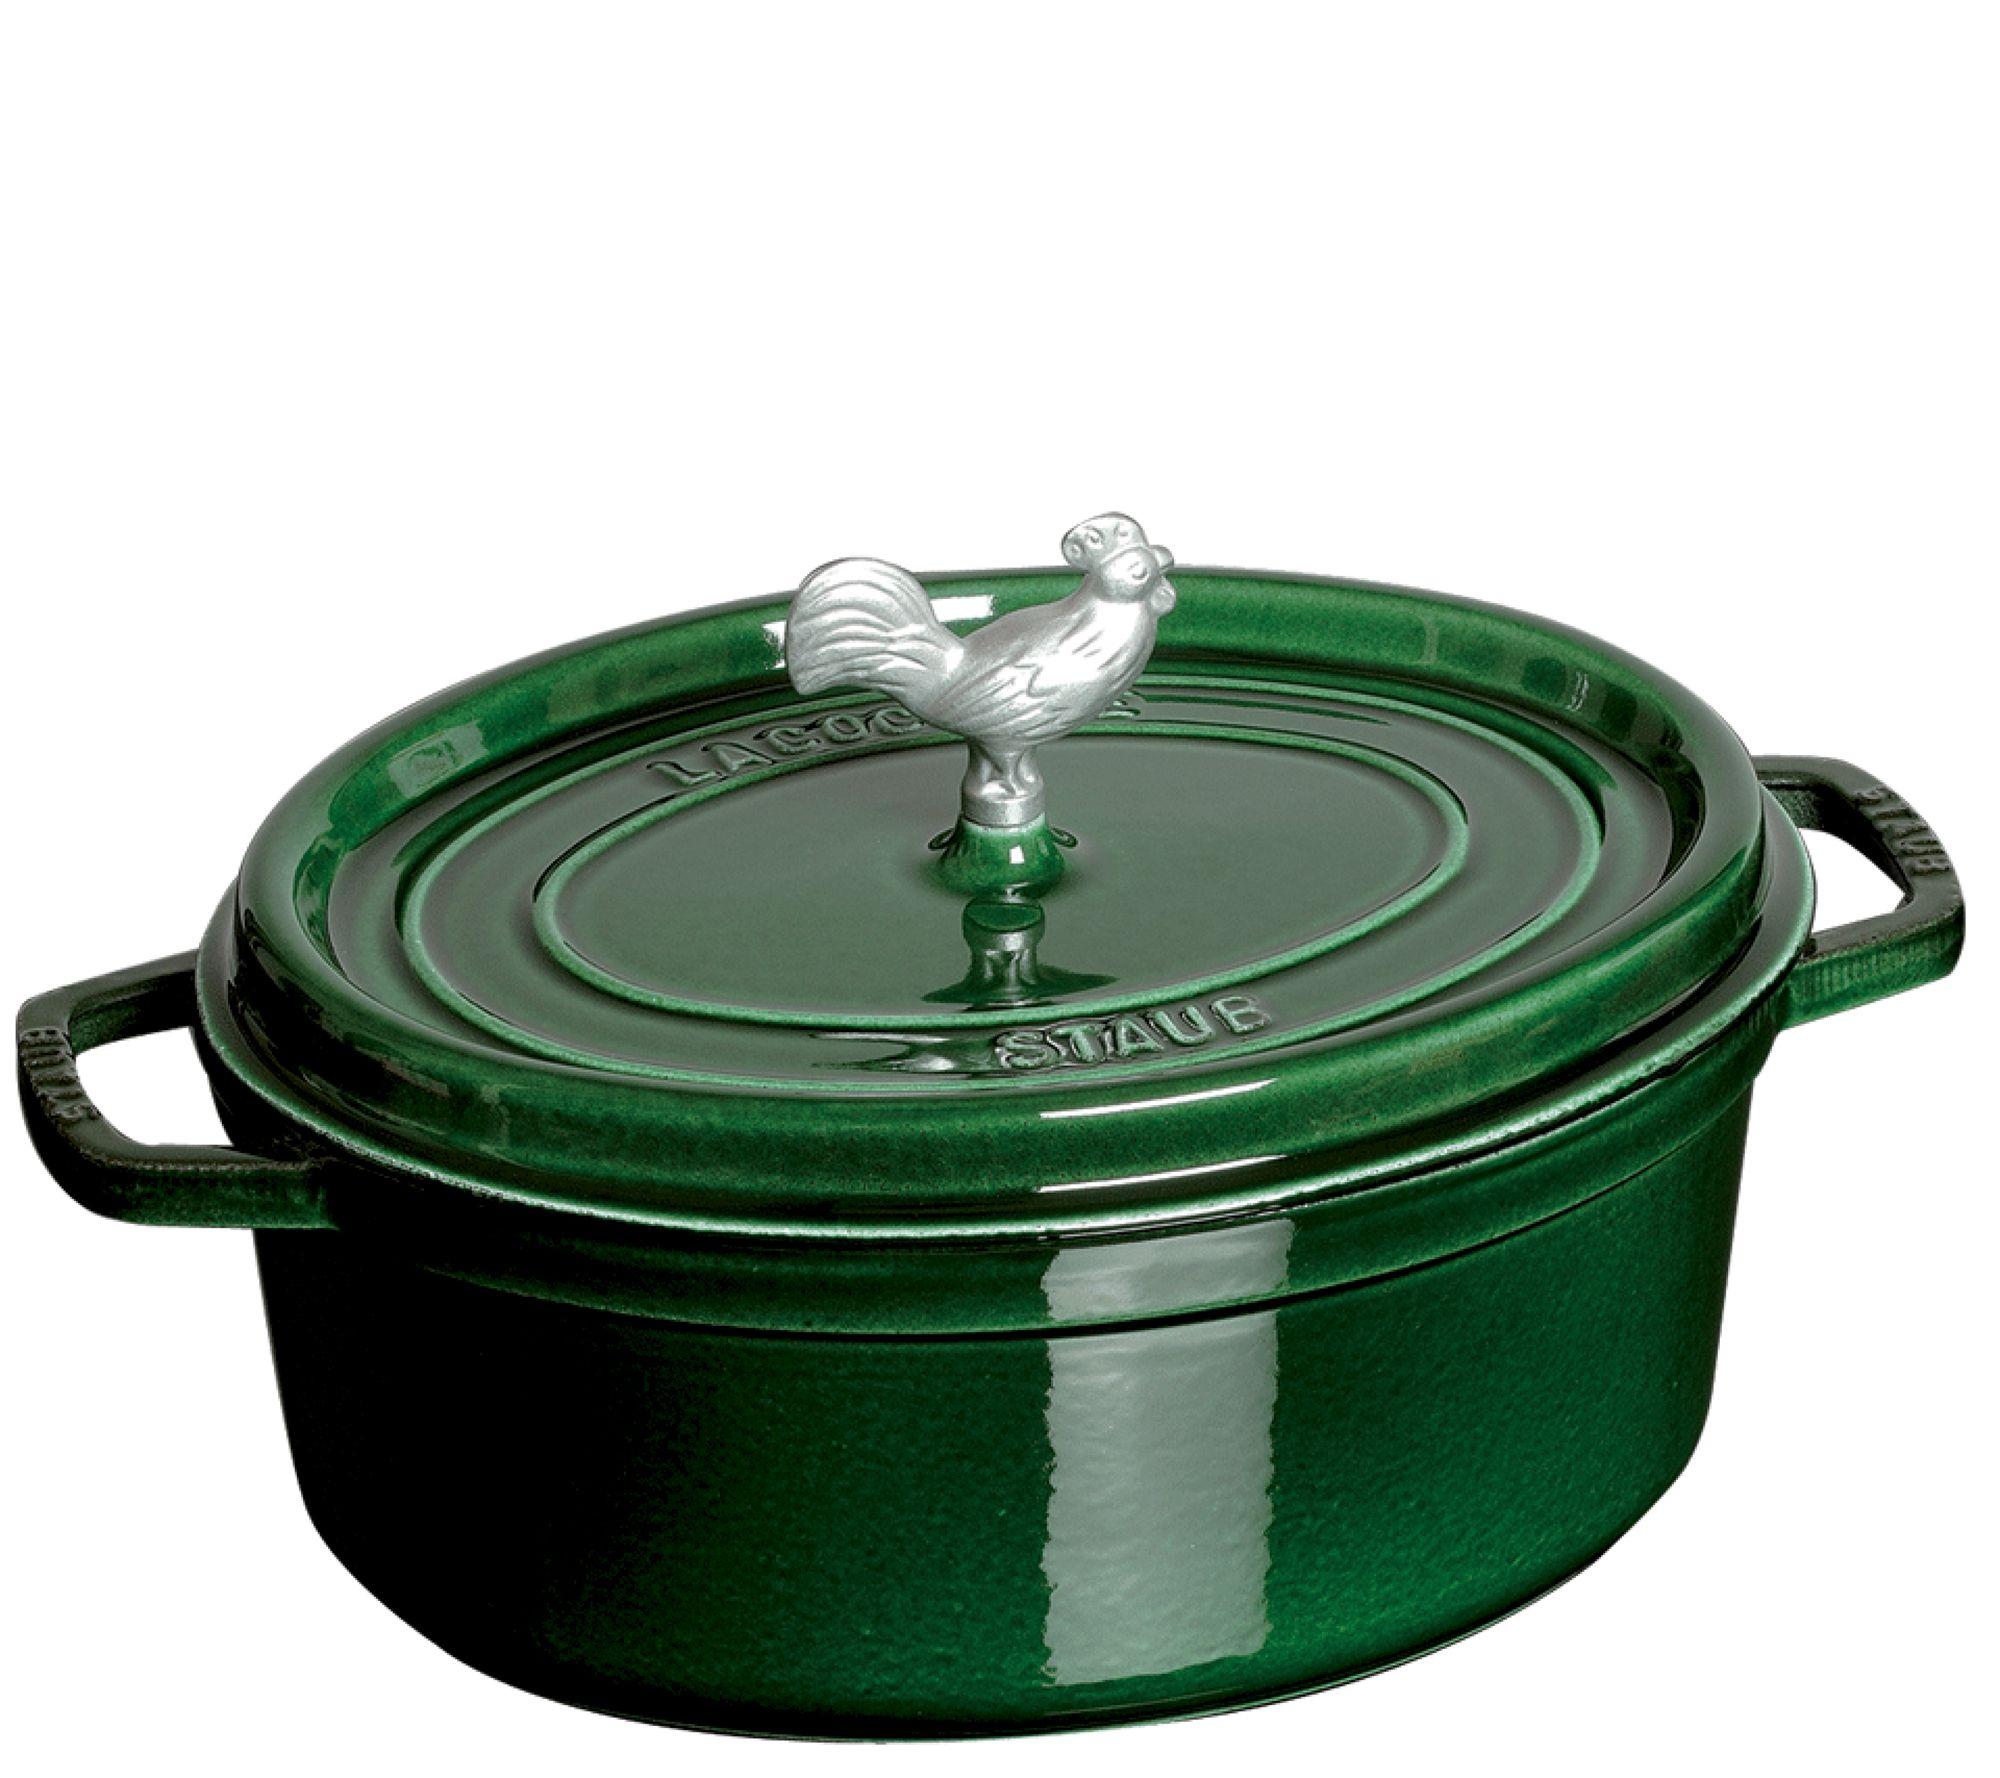 Save 27% on a Staub cast-iron Dutch oven